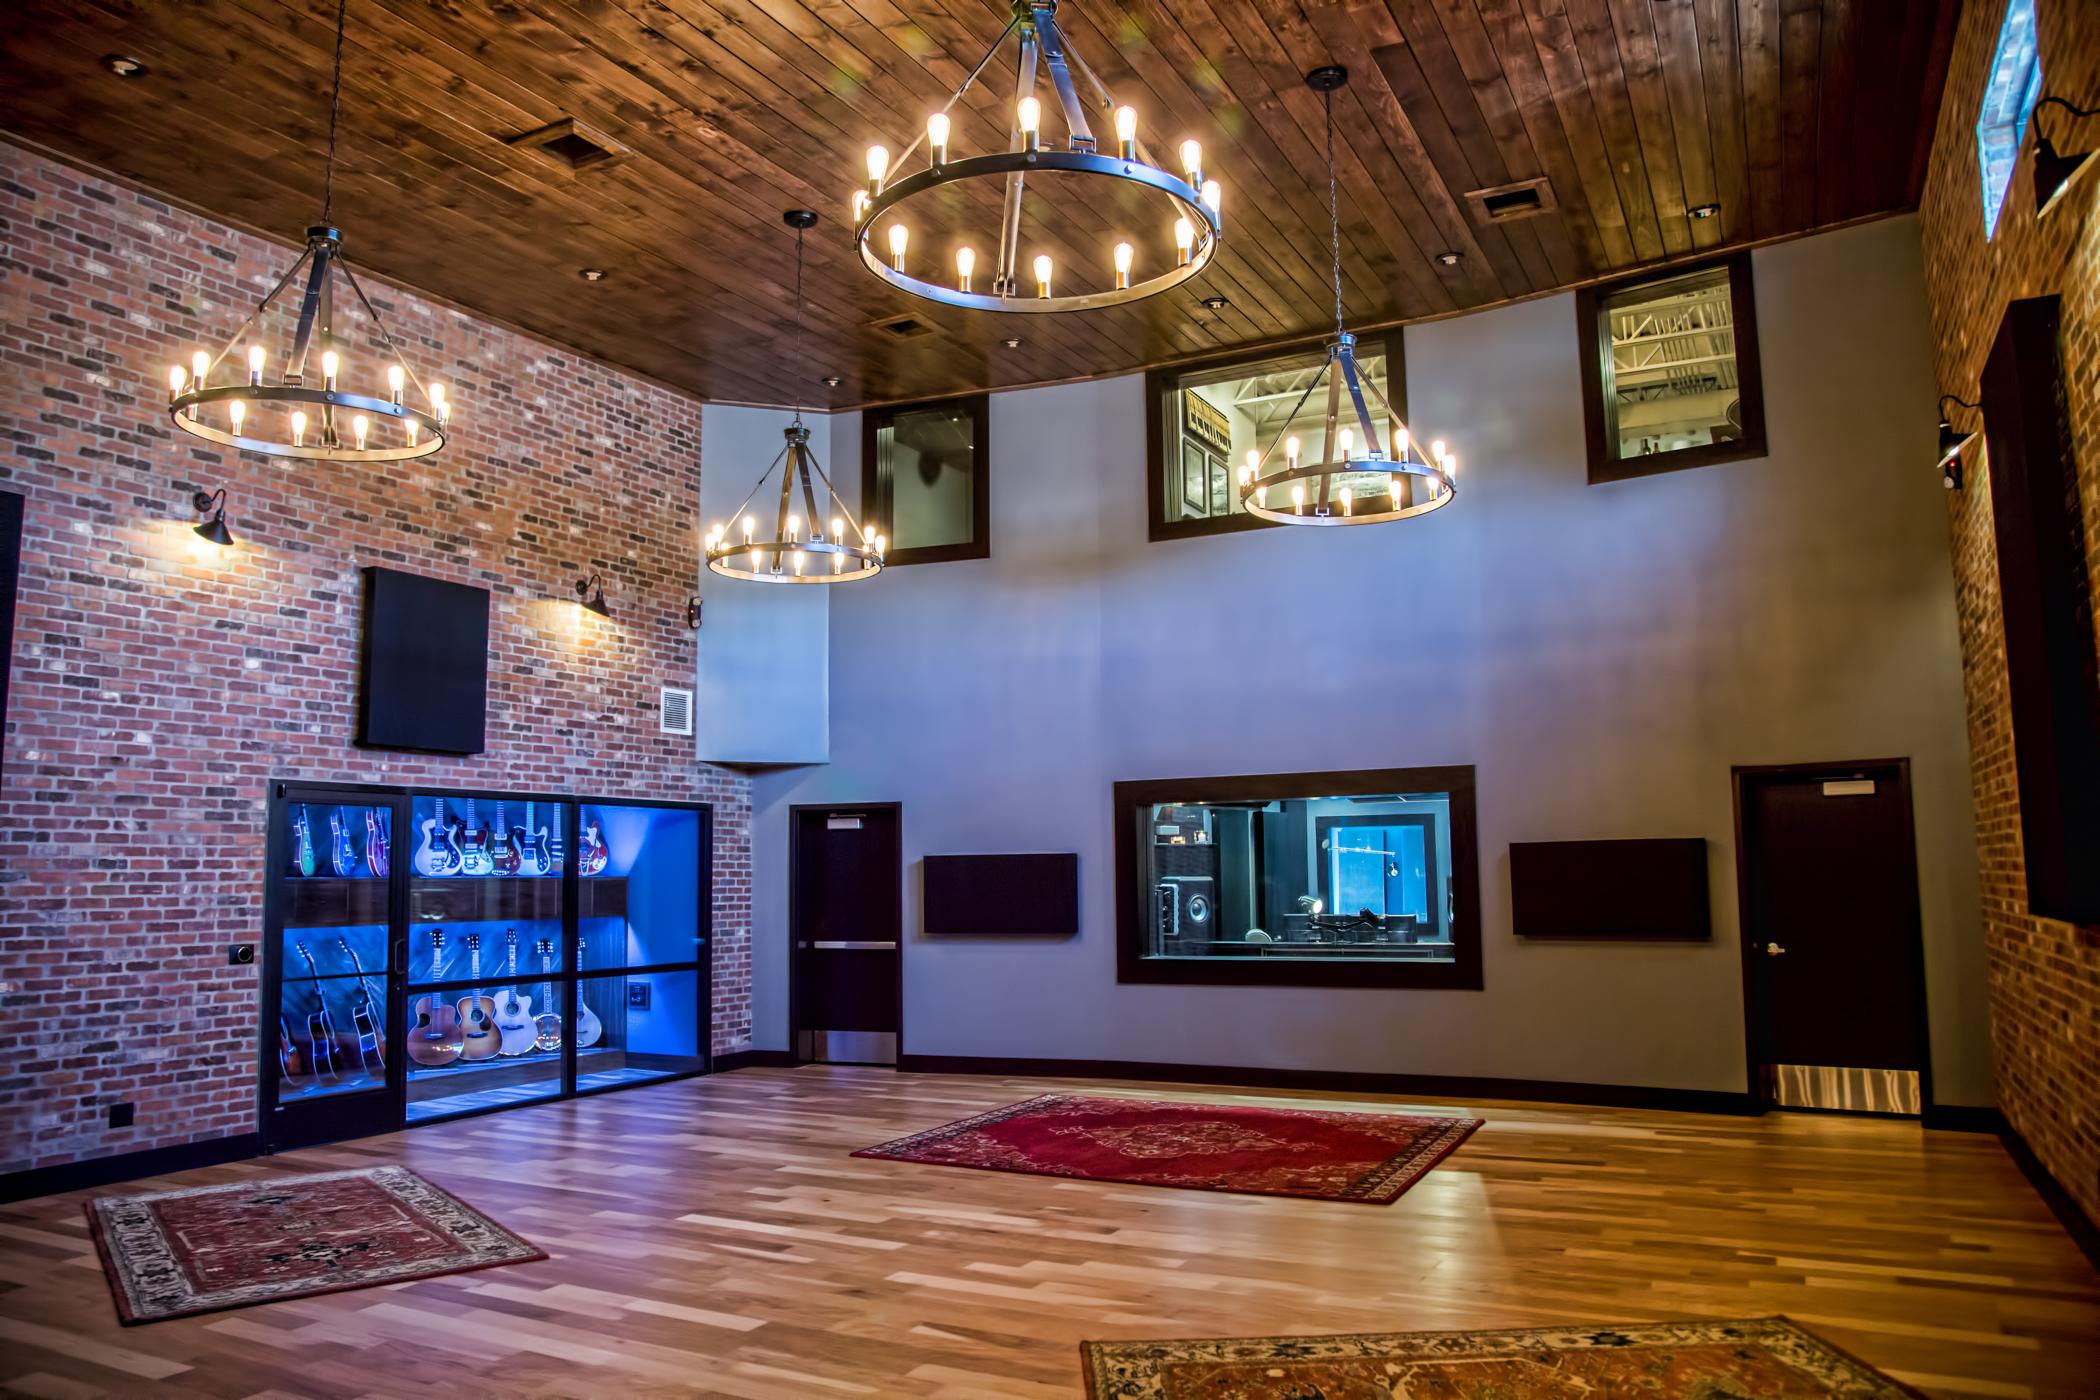 haxton road studios a professional recording studio in bentonville